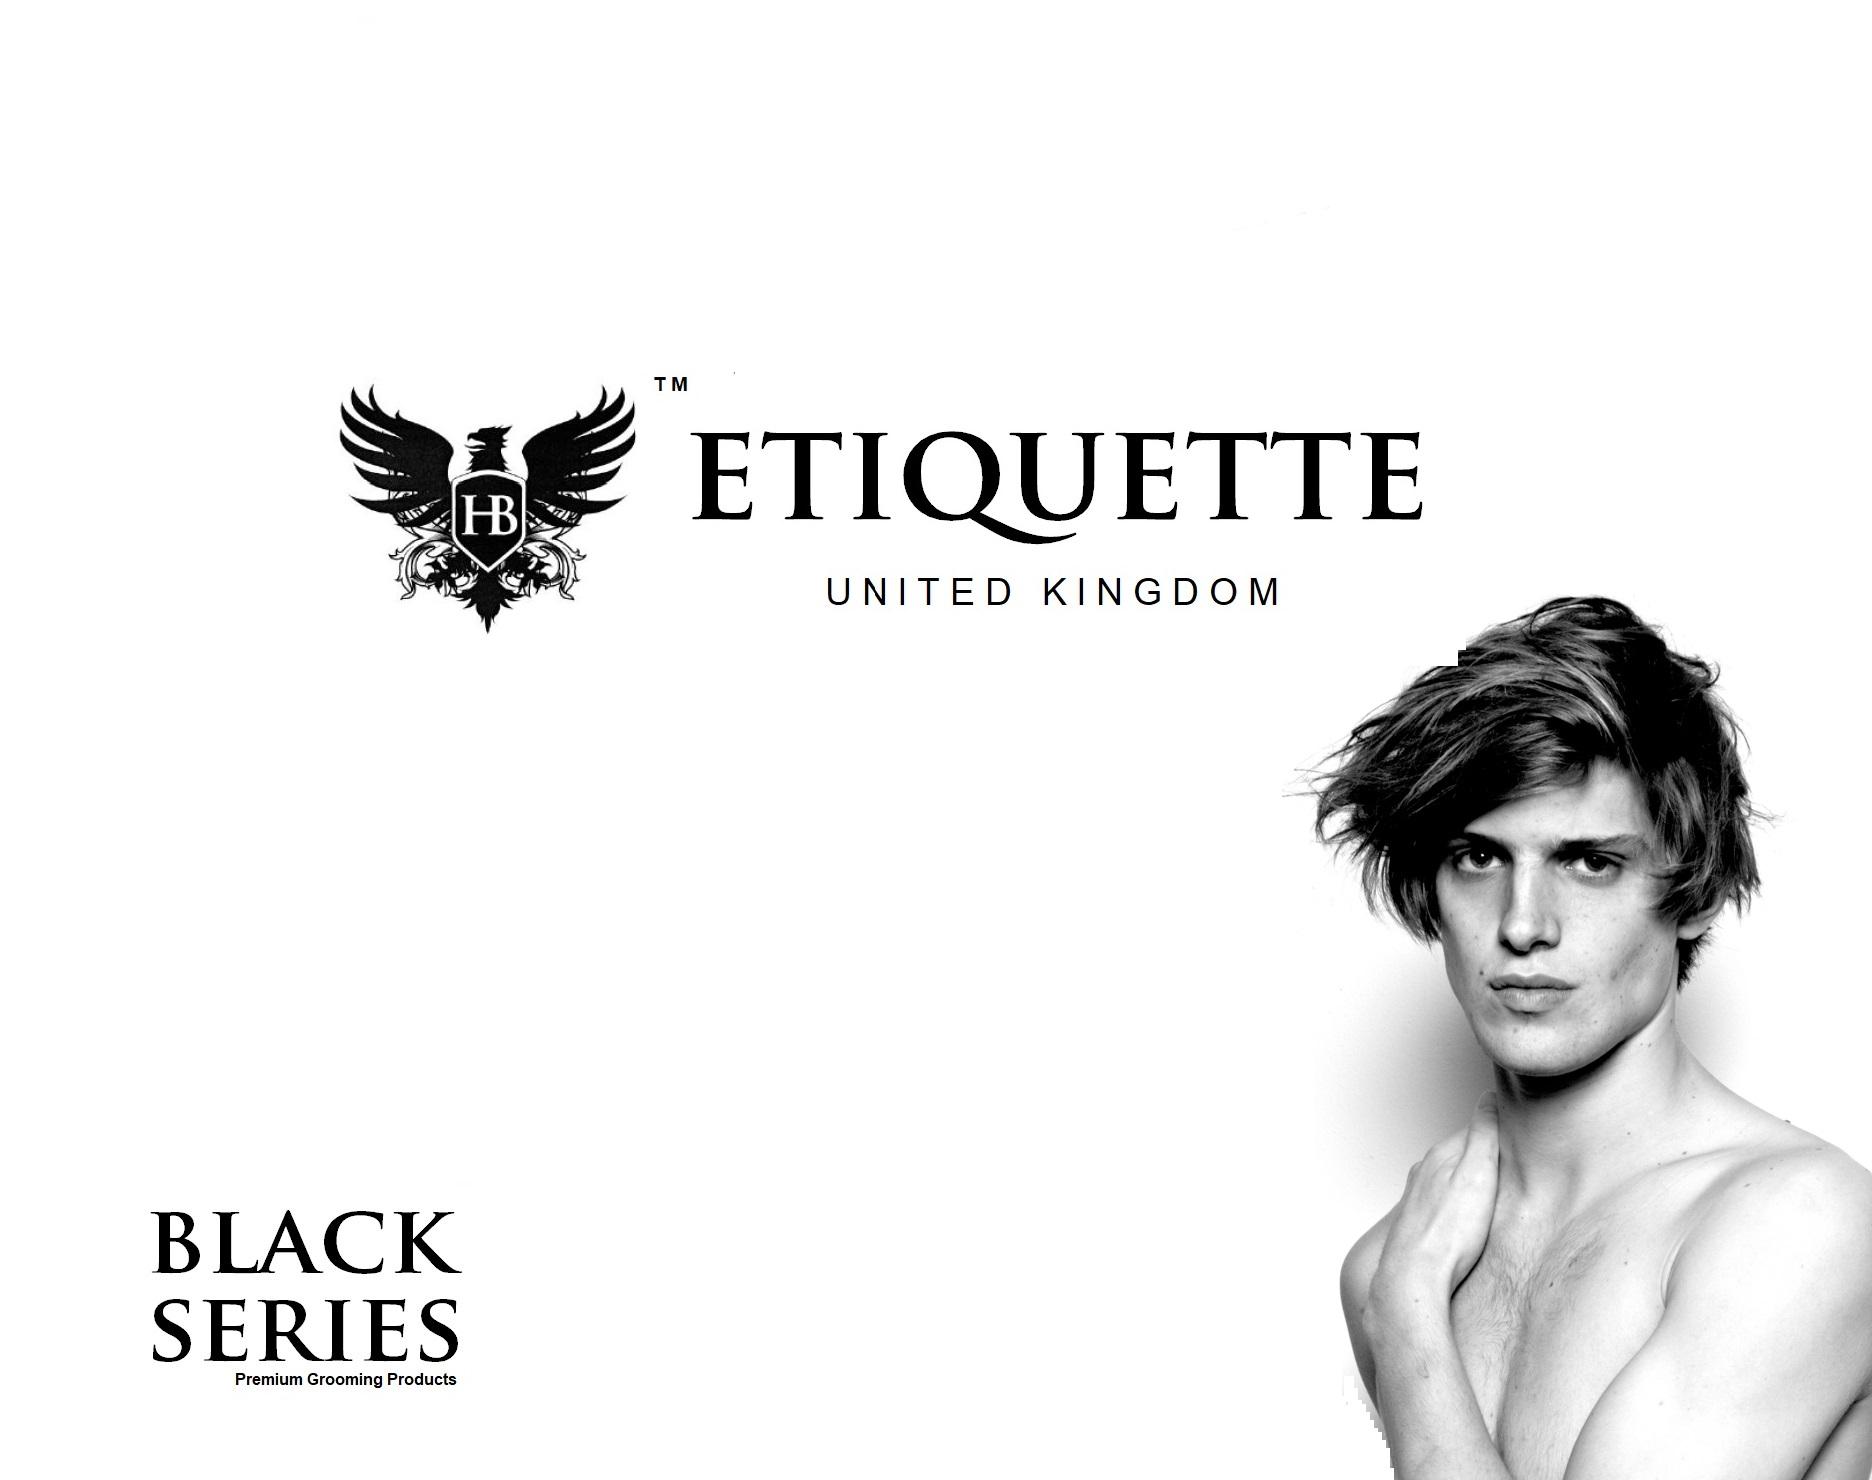 hairbond etiquette